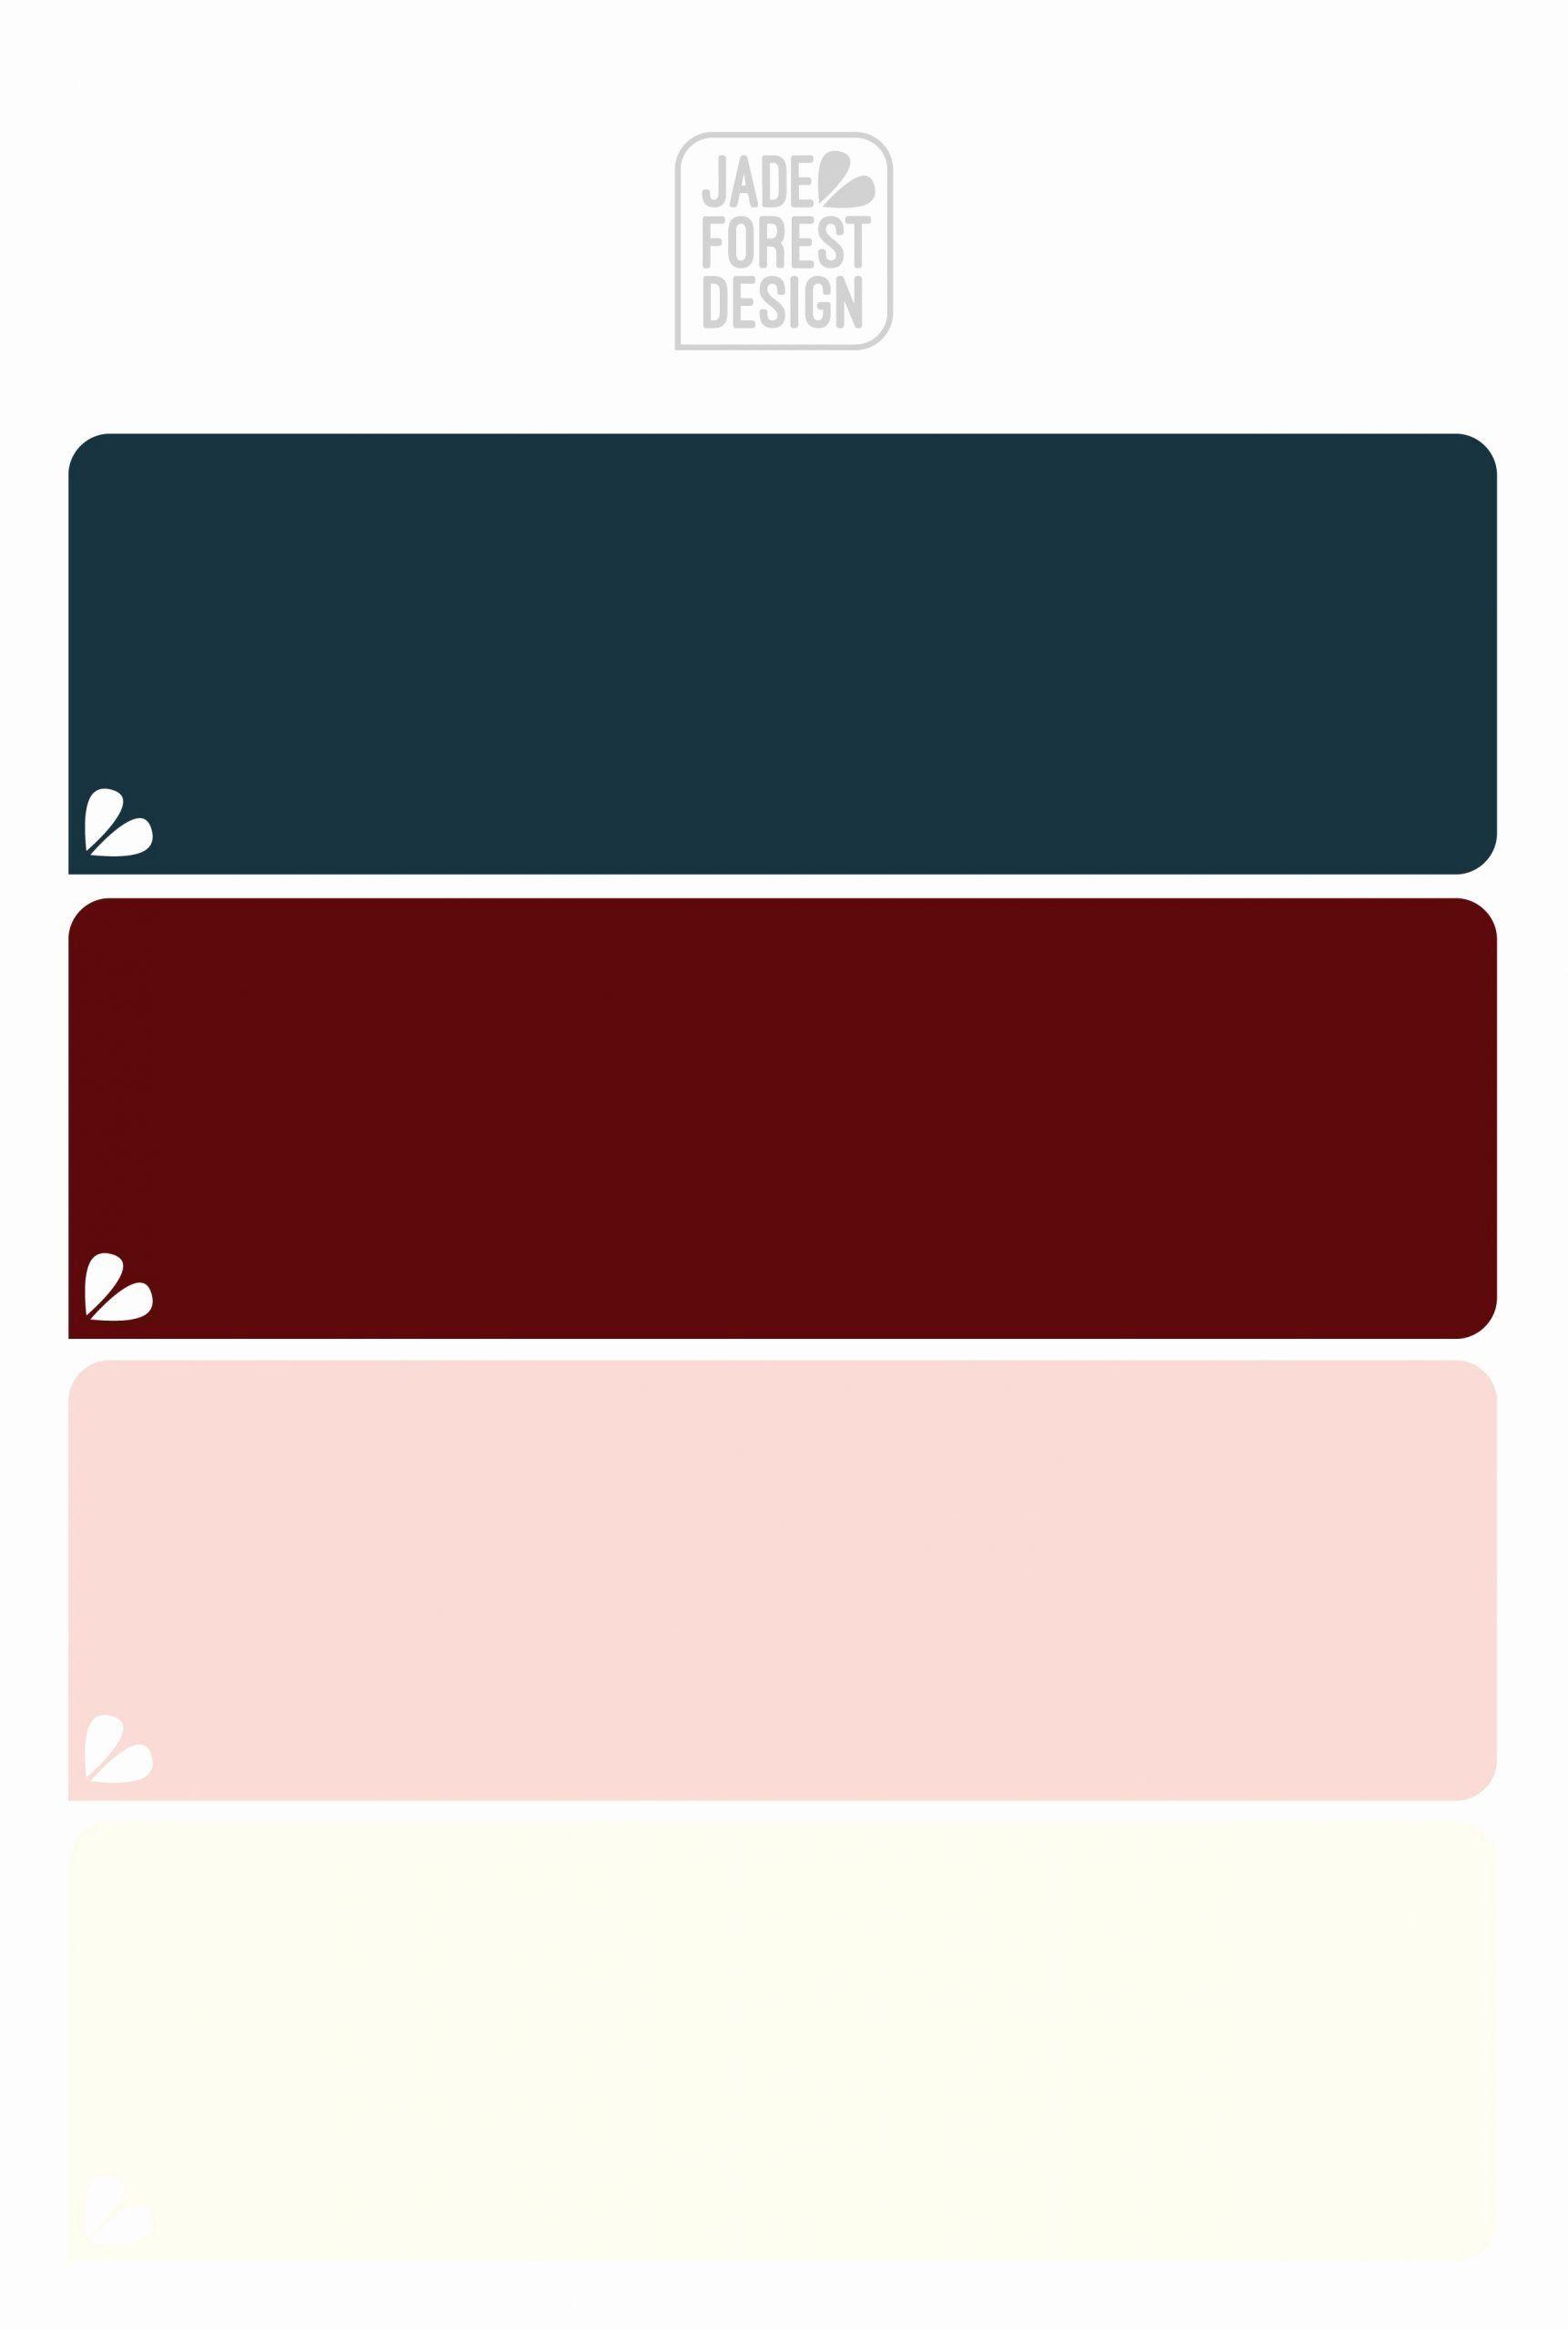 Burgundy Bedroom Color Schemes Beautiful Burgundy Red Navy Blue Blush Pink Ivory Cream Color S In 2020 Burgundy Bedroom Wedding Color Schemes Blue Color Palette Pink